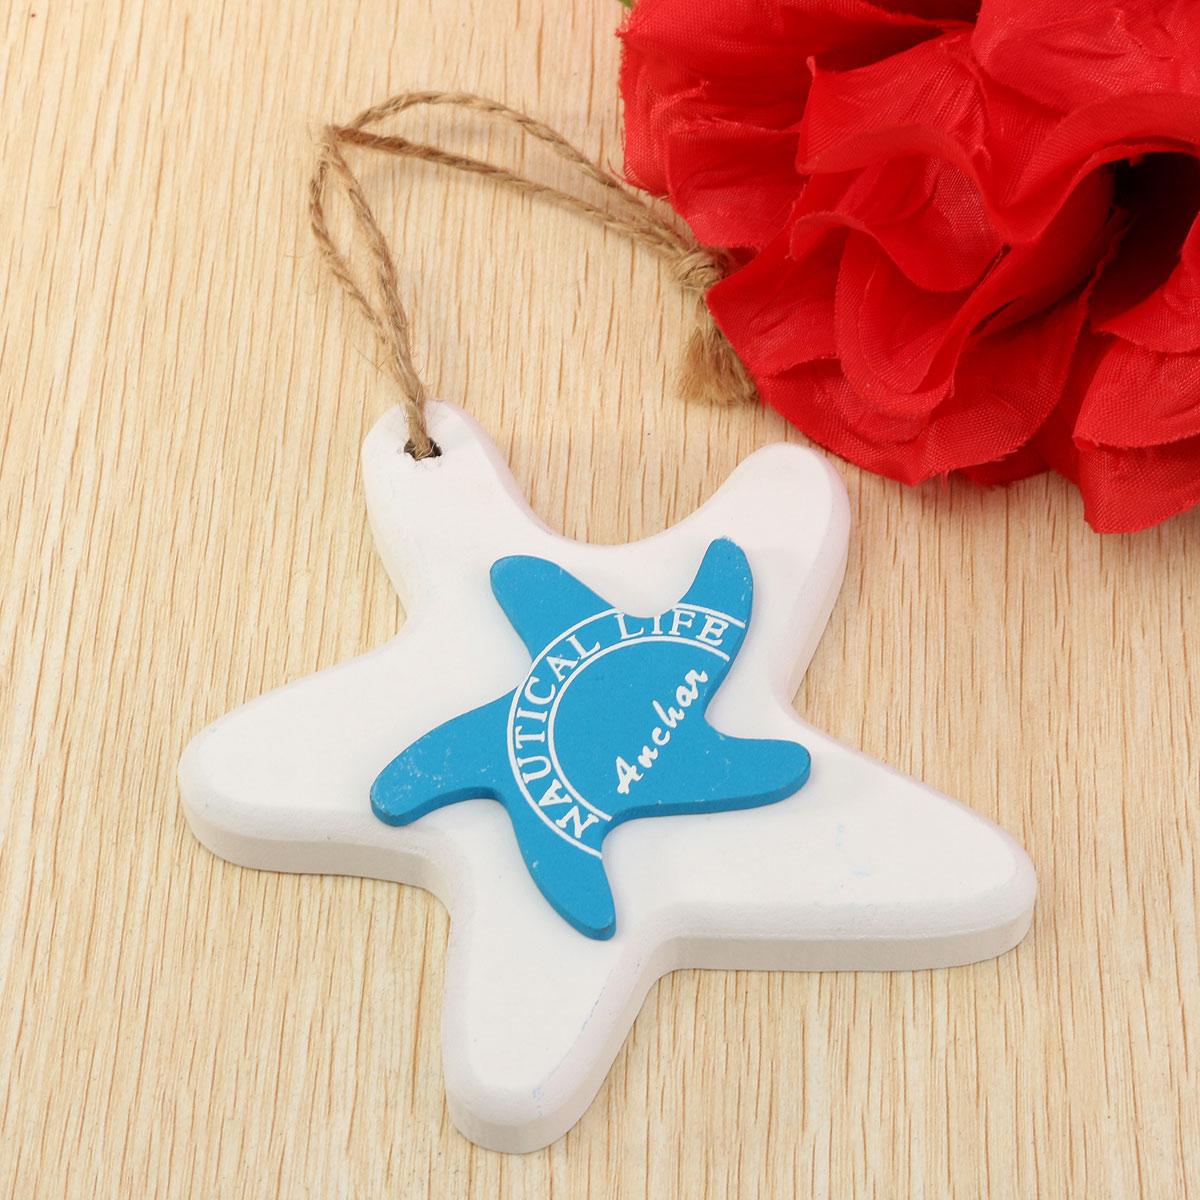 Nautical Wooden Fish Starfish Wall Hanging Ornaments Home Door Decor Hanger Gift